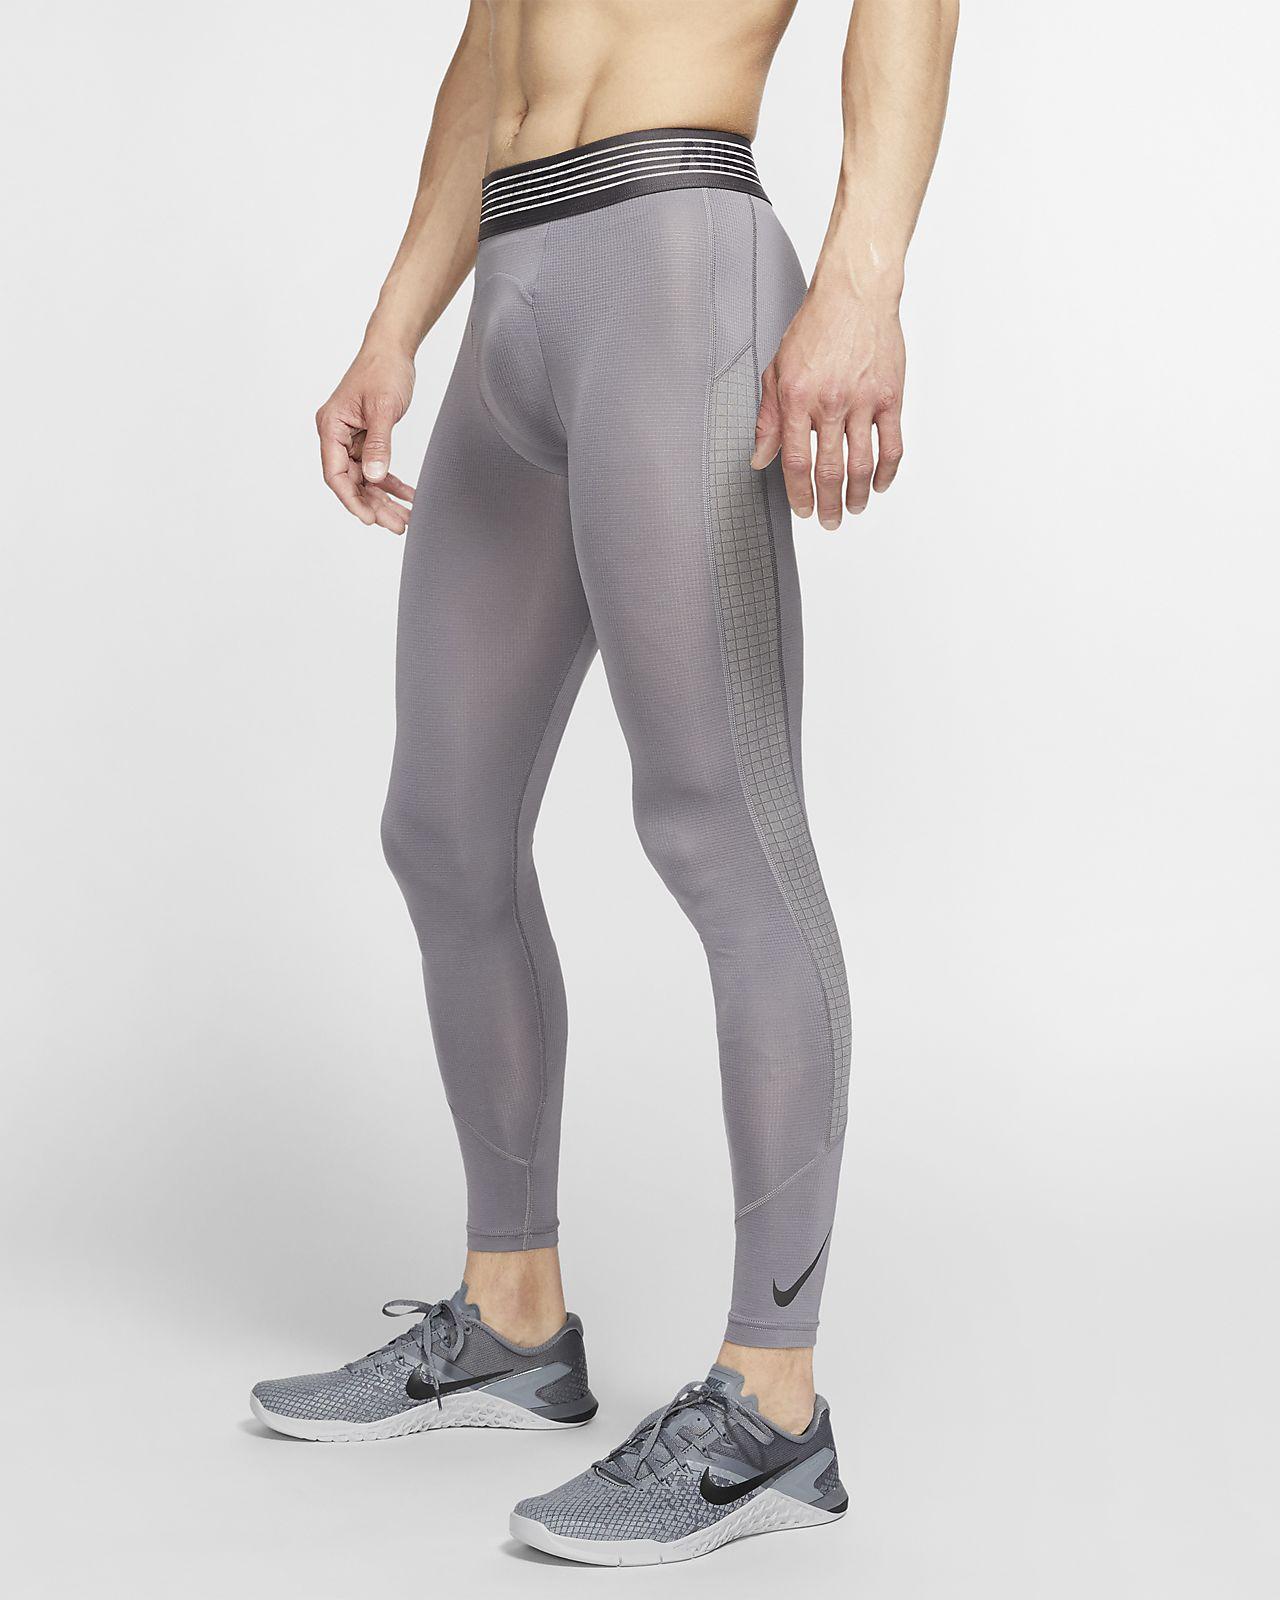 Nike Pro Breathe Malles - Home